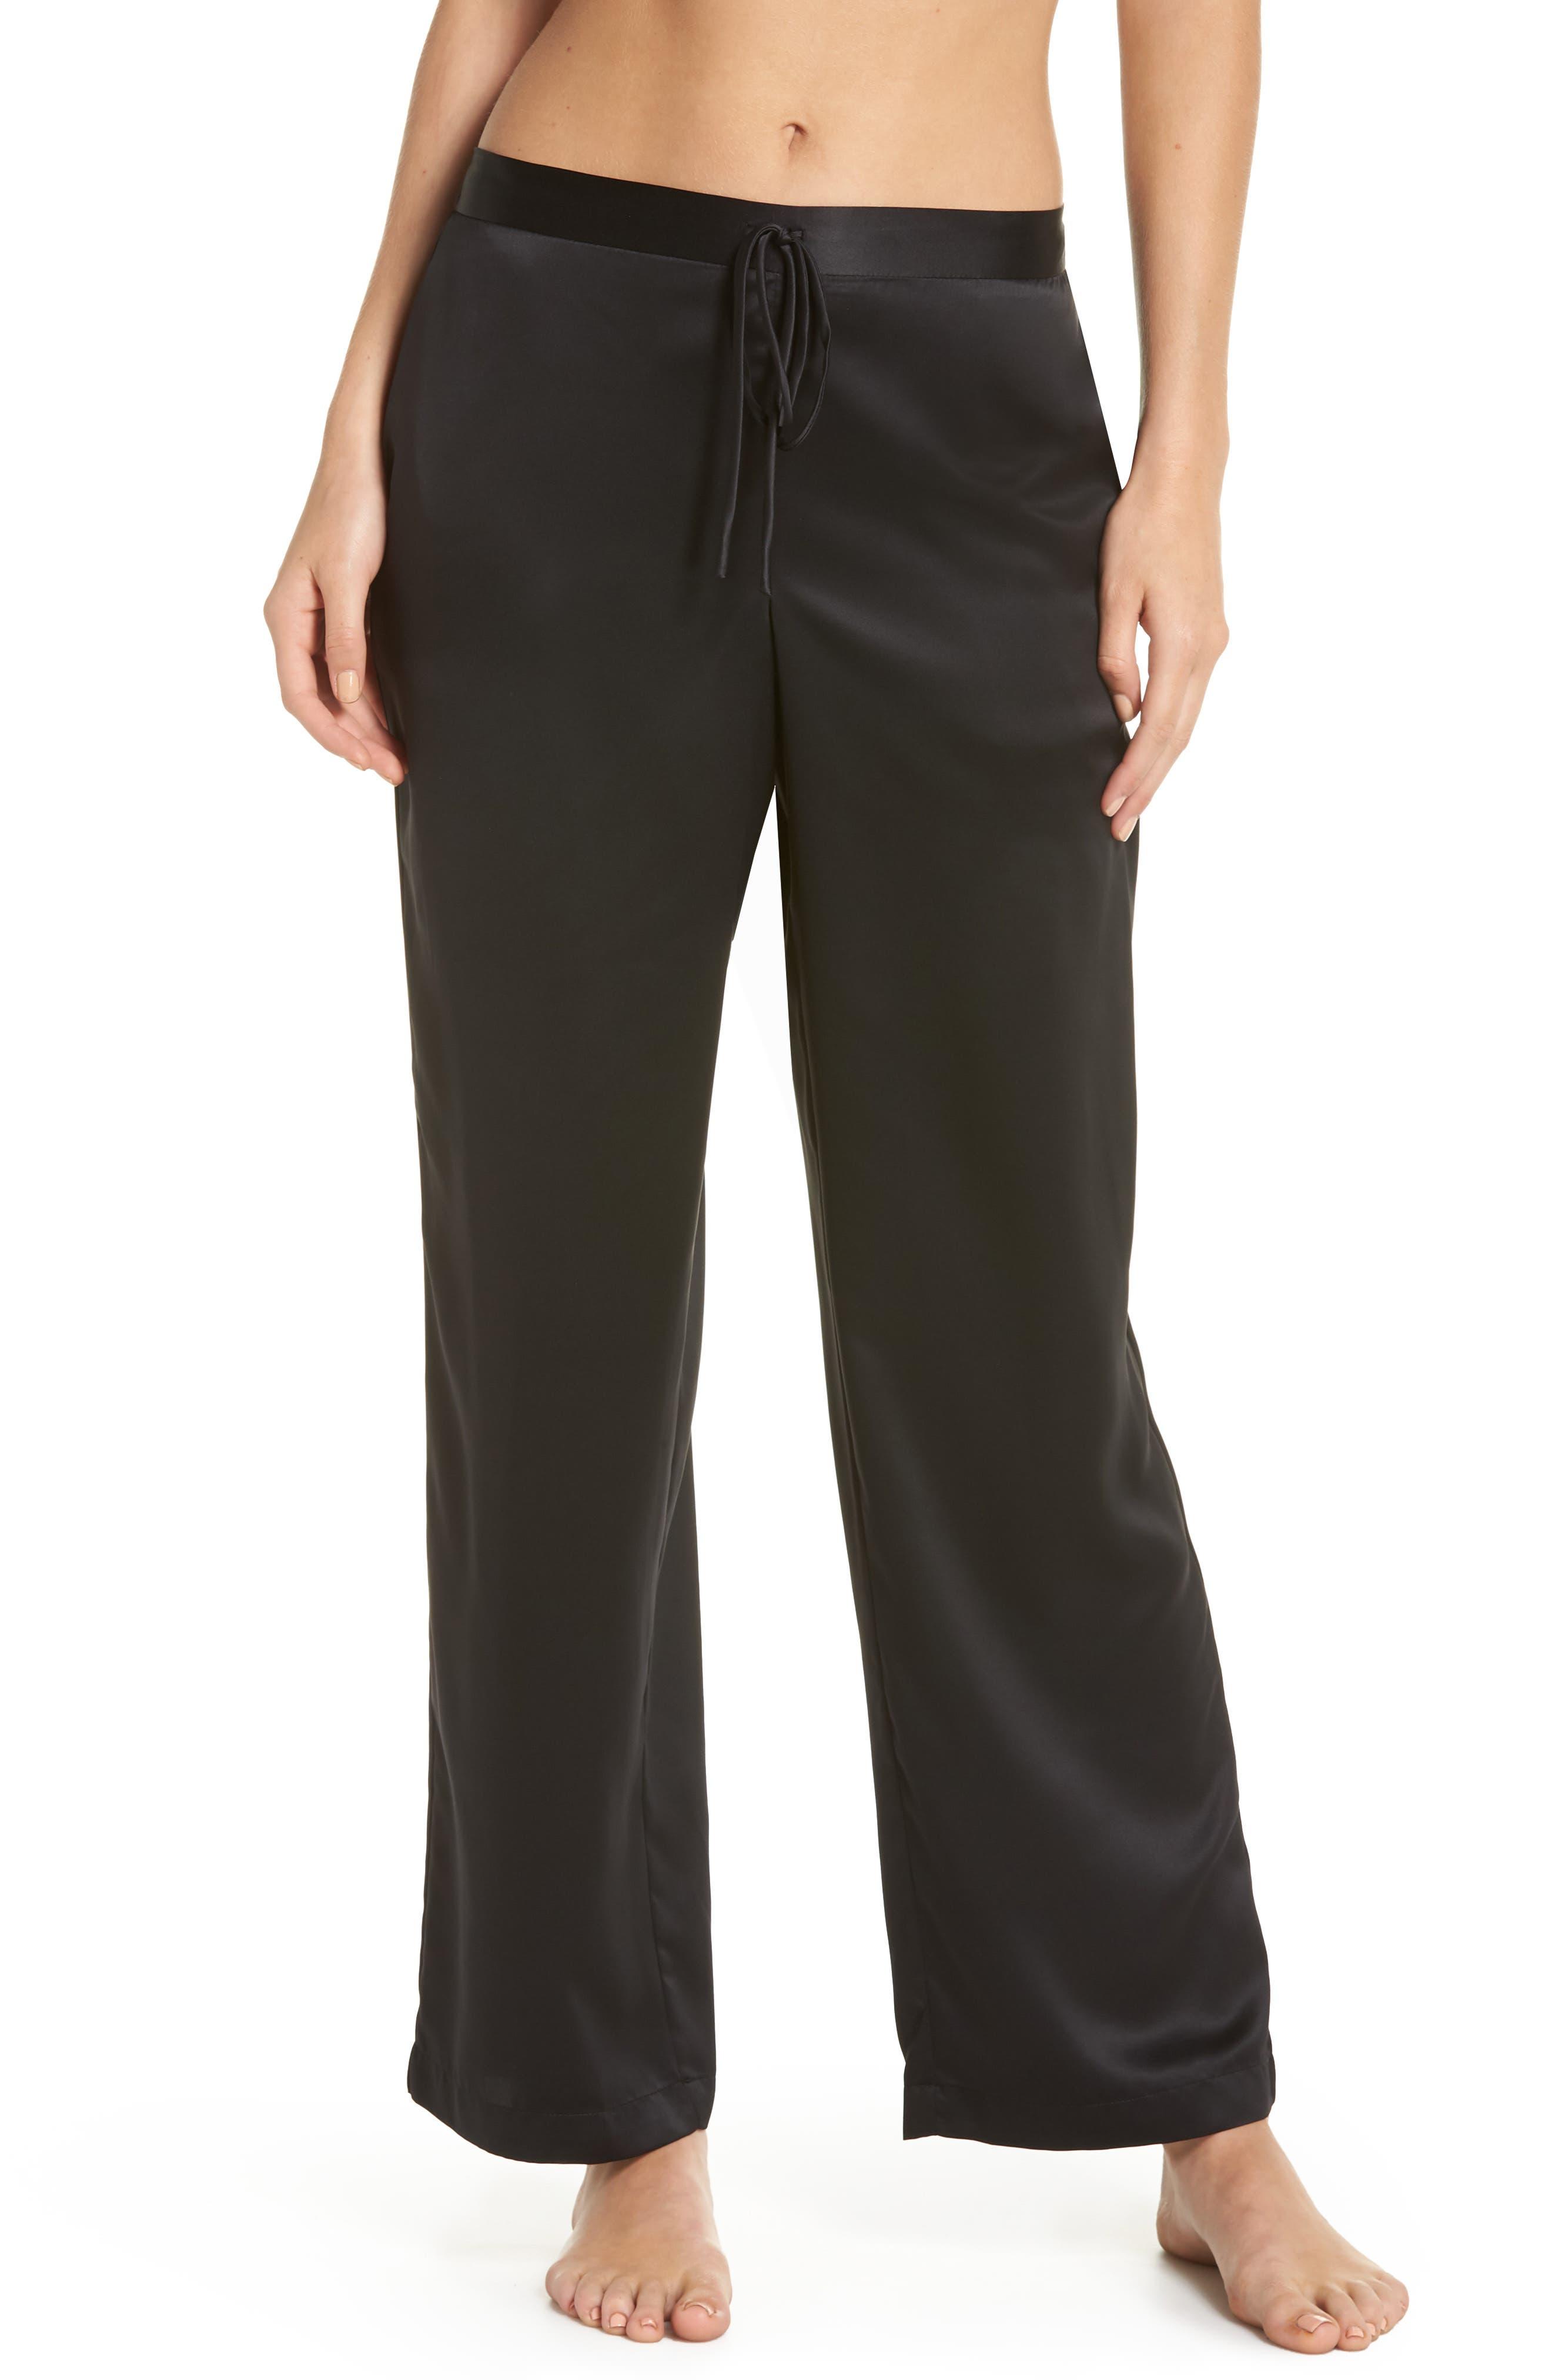 Natori Satin Elements Pajama Pants, Black